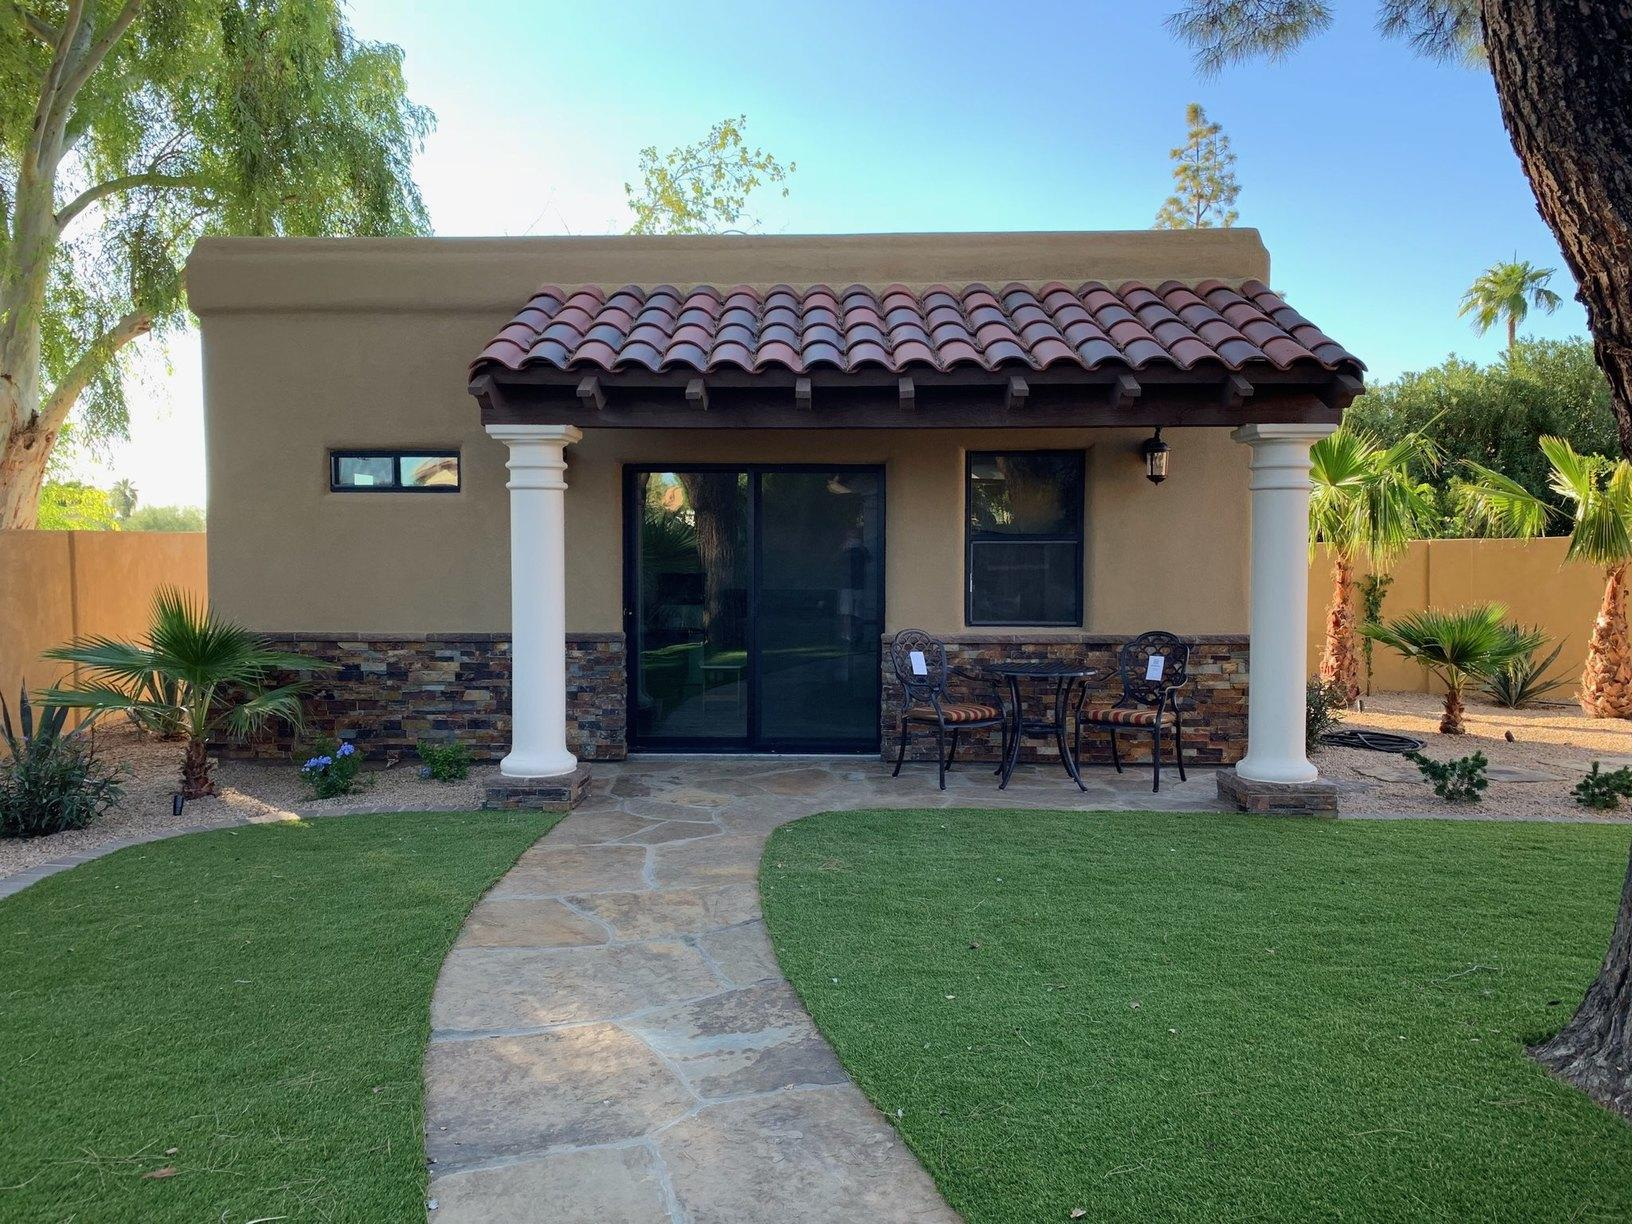 Phoenix Biltmore Casita Guesthouse 85016